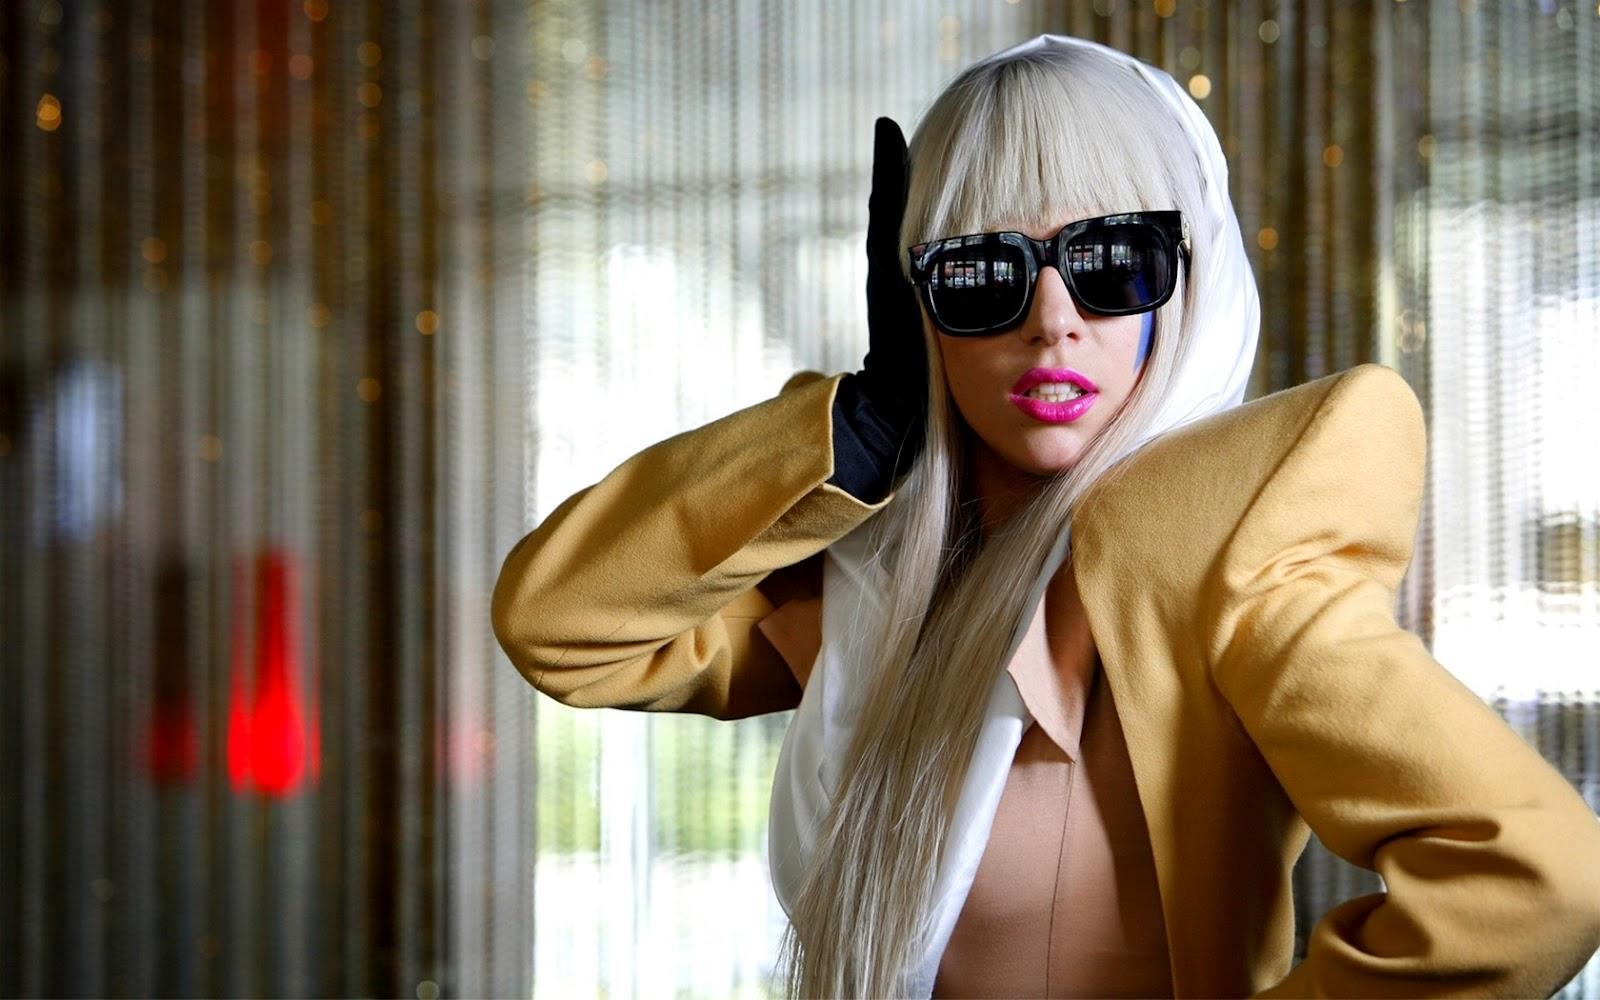 Lady-Gaga-Yellow-Jacket-and-Sunglasses-H